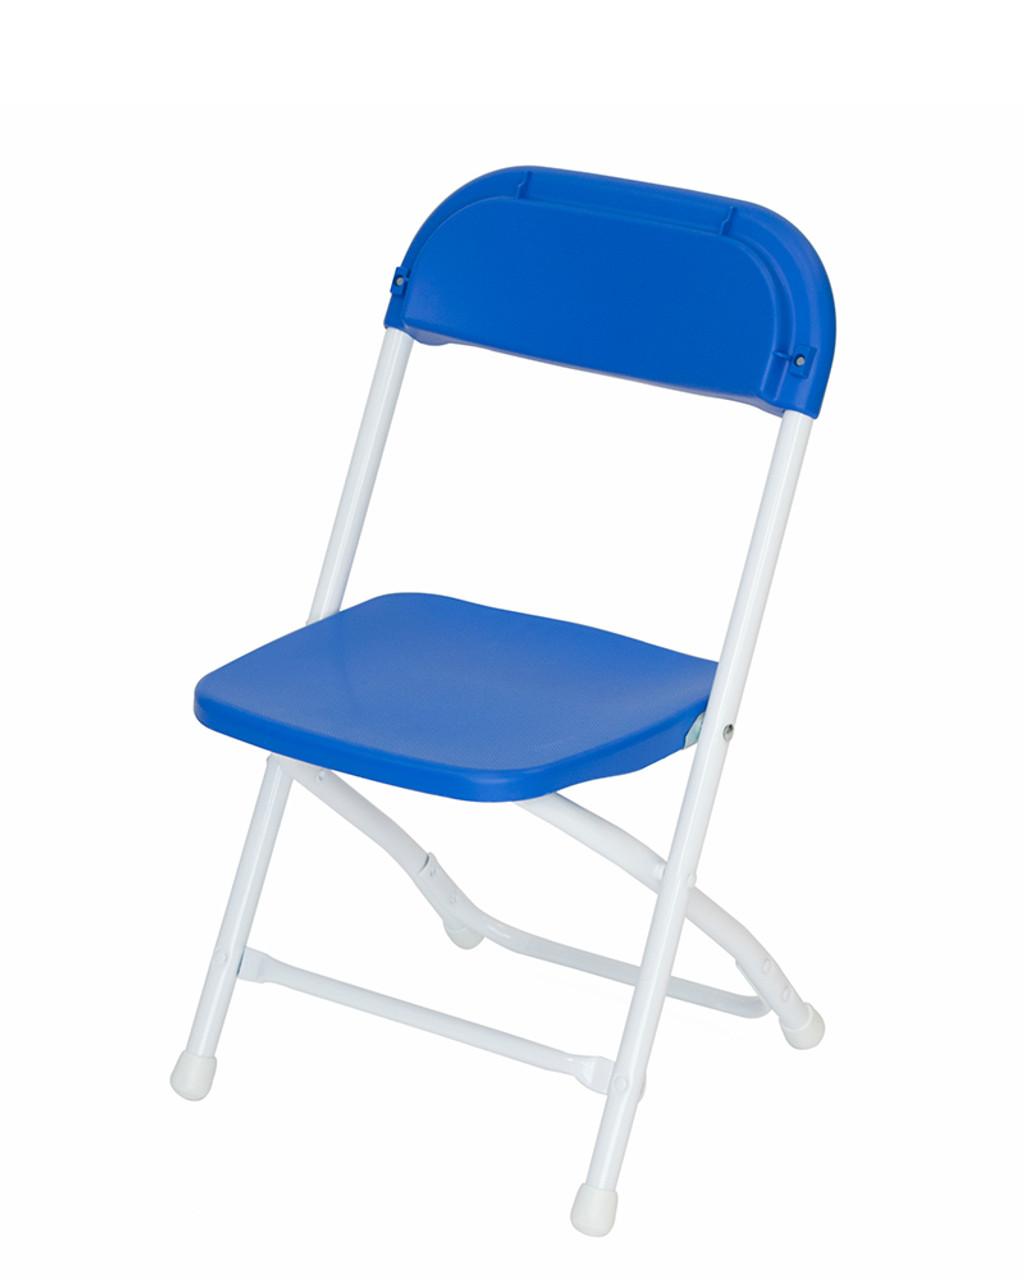 Sensational Kids Folding Chairs Childrens Folding Chairs Machost Co Dining Chair Design Ideas Machostcouk